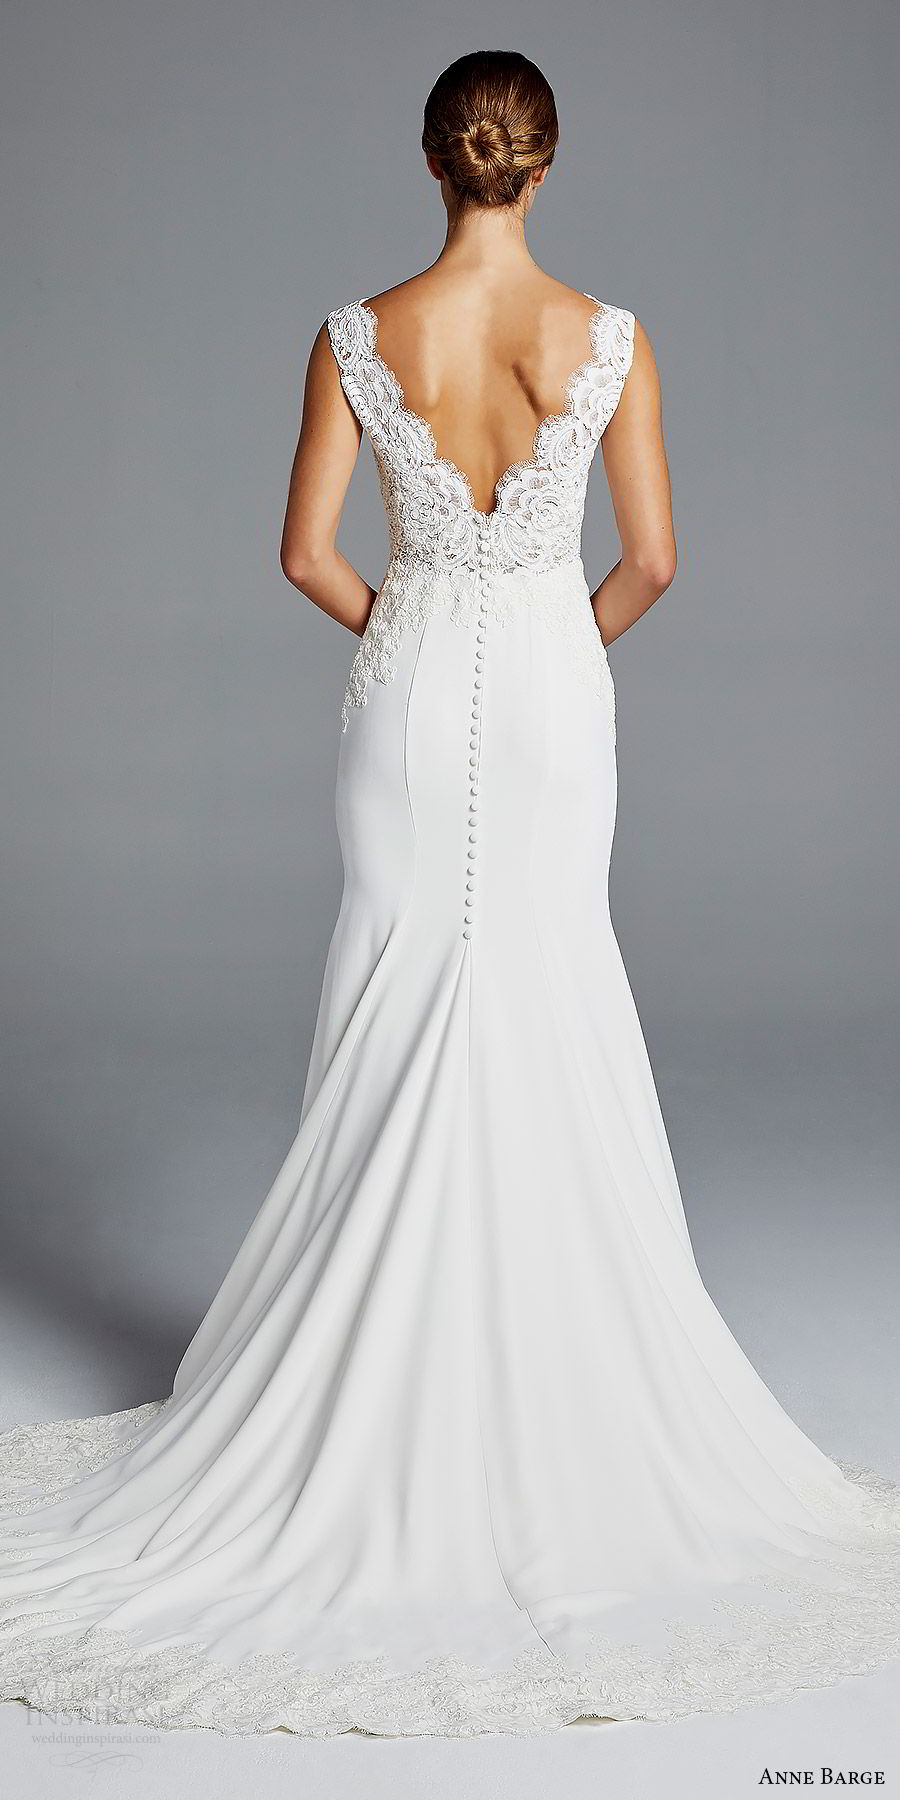 anne barge bridal spring 2019 sleeveless thick lace straps deep v neck embellished bodice sheath wedding dress (lana) bv v back chapel train chic elegant